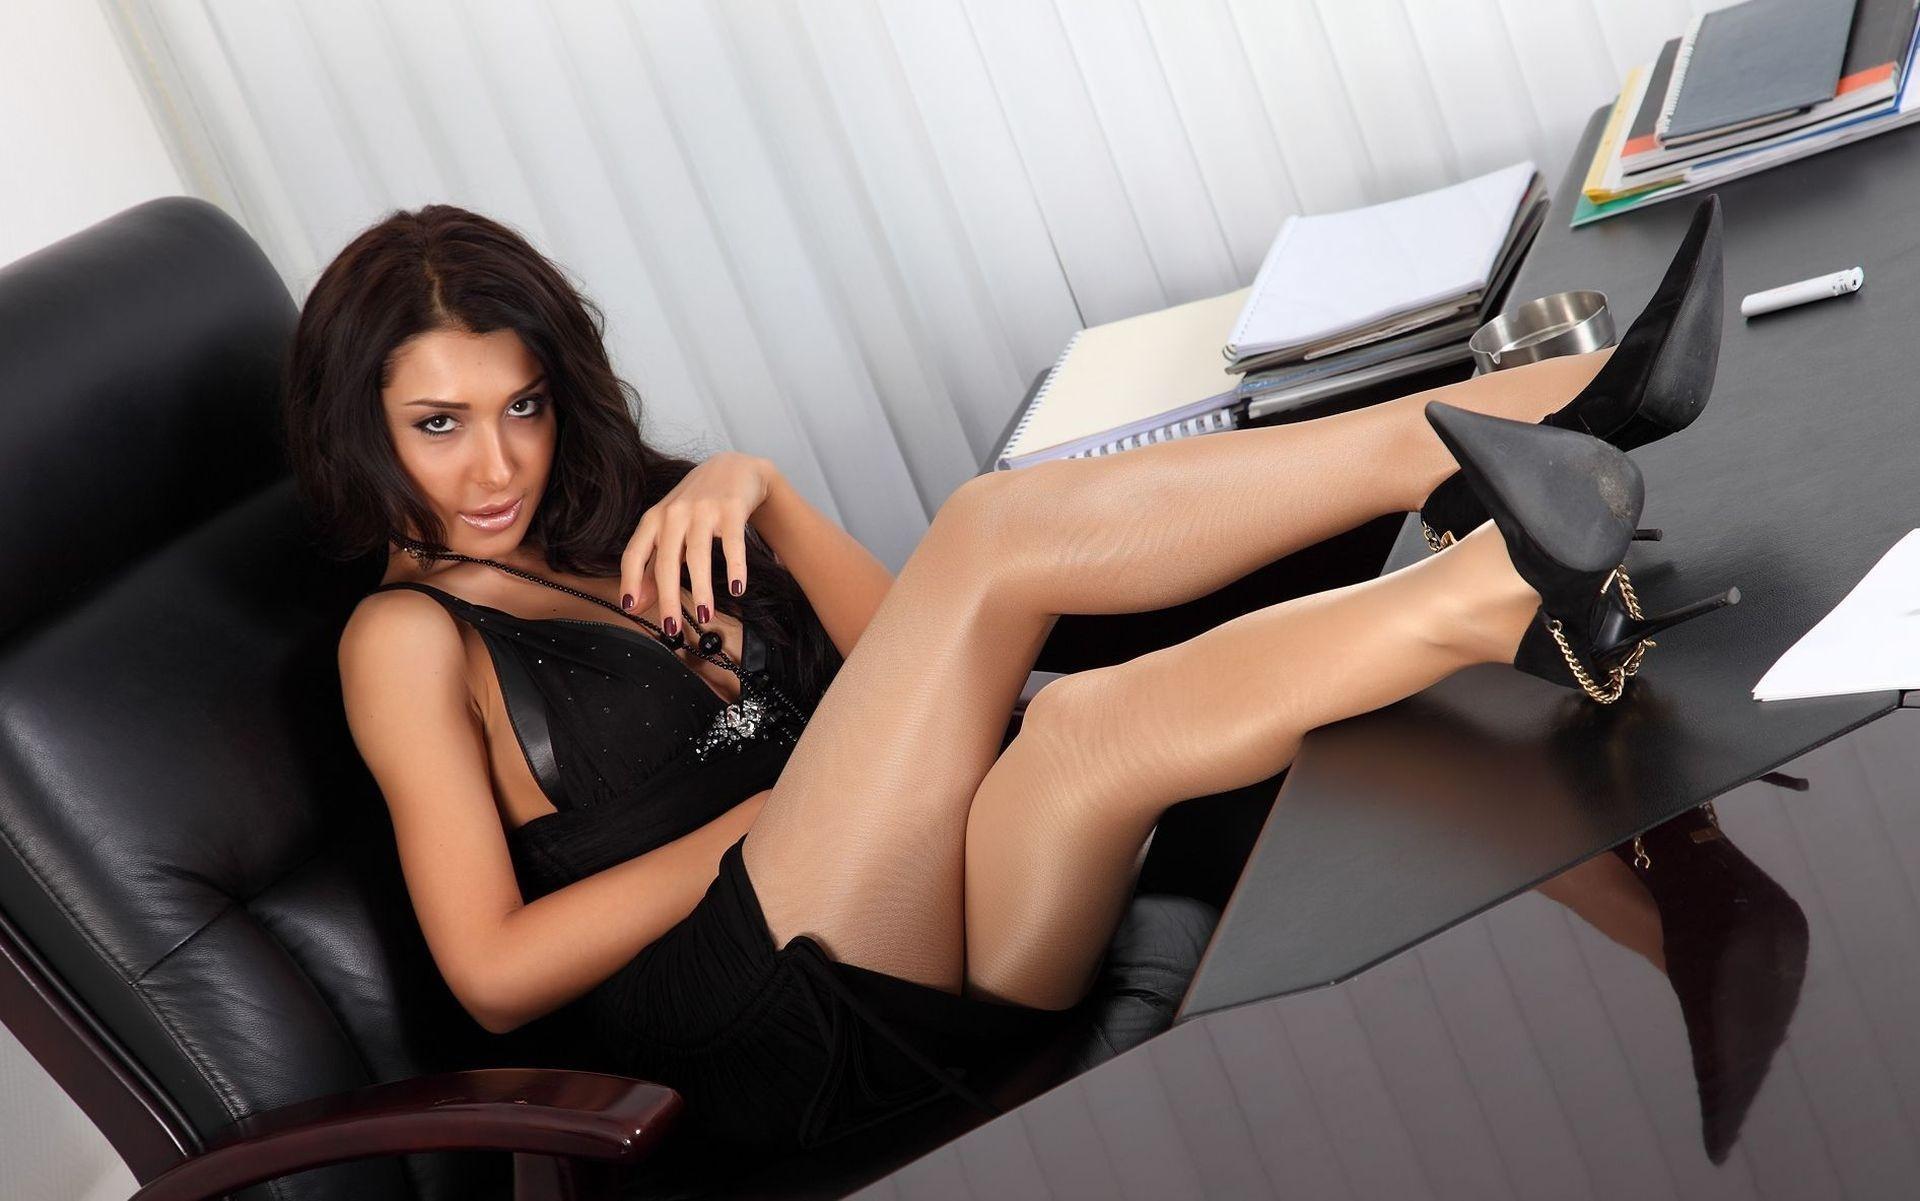 Leggy brunette MILF Jennifer Dark chained to office chair during rough sex № 207974 без смс